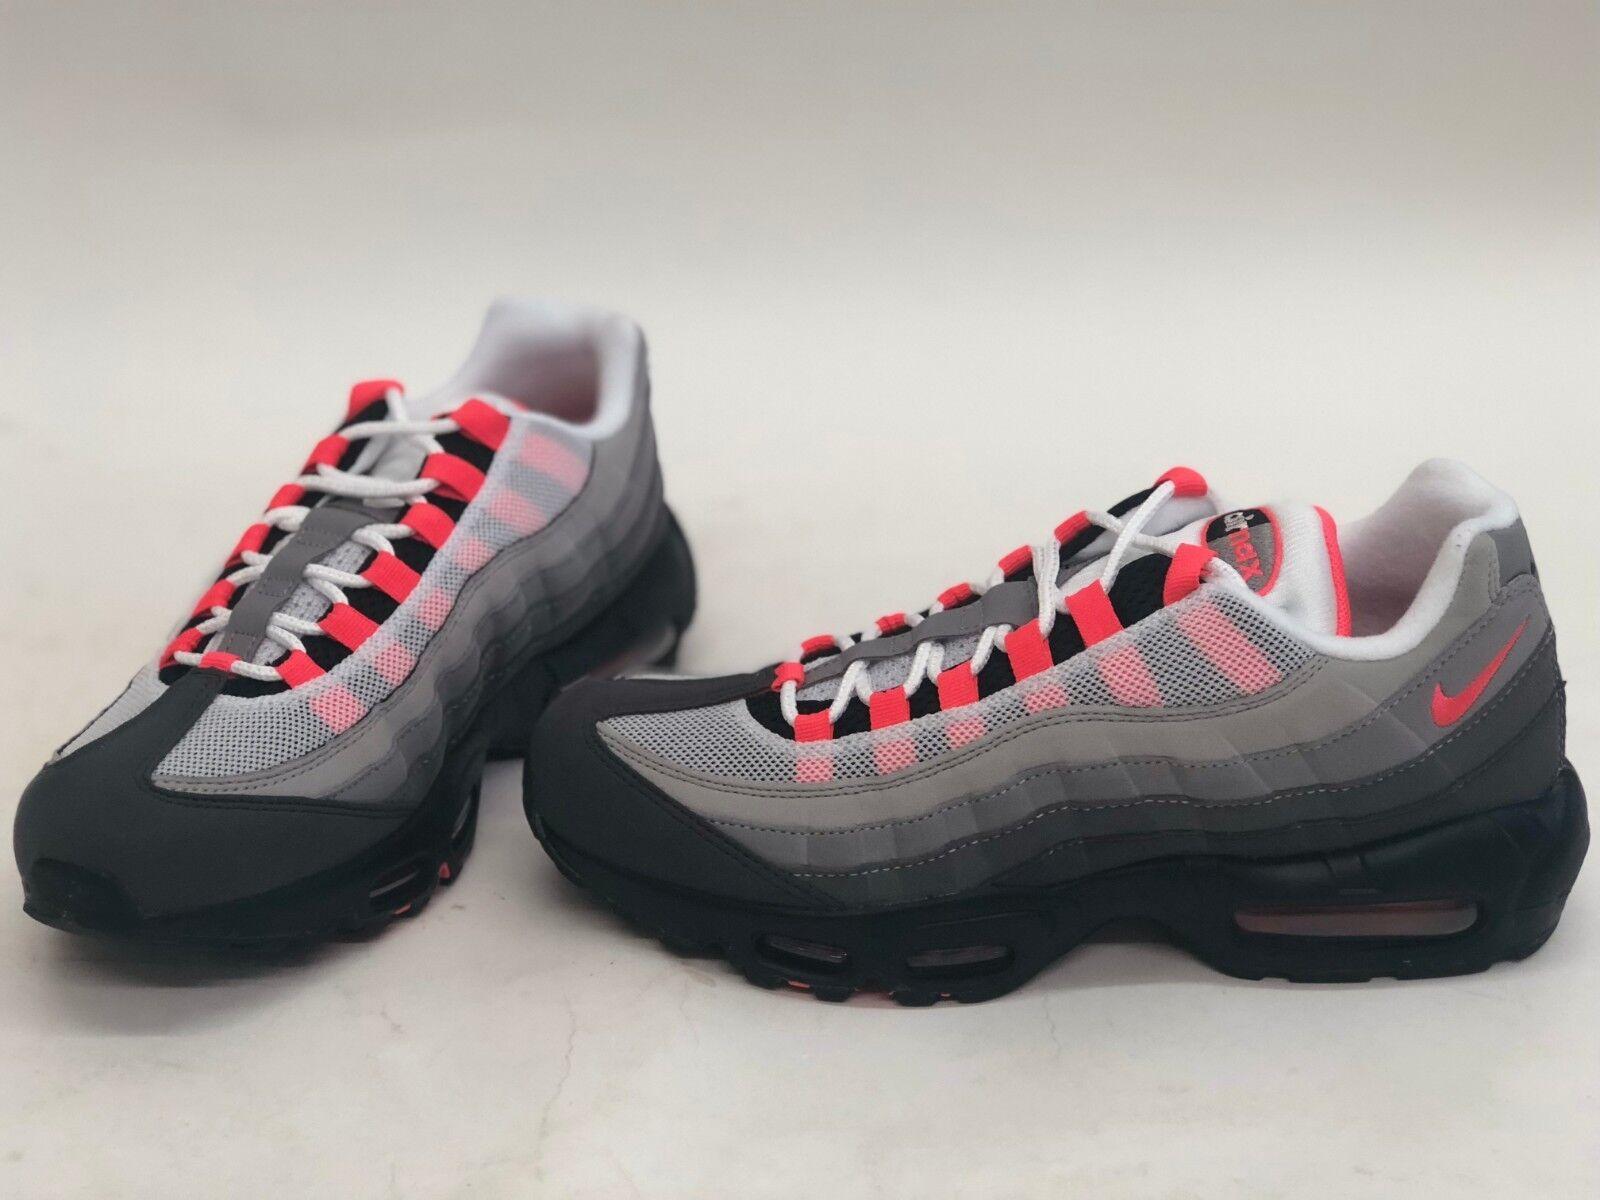 11 scarpe nike air max nib Uomo dimensioni essenziali le scarpe 11 da ginnastica at2865-100 95 c74e13